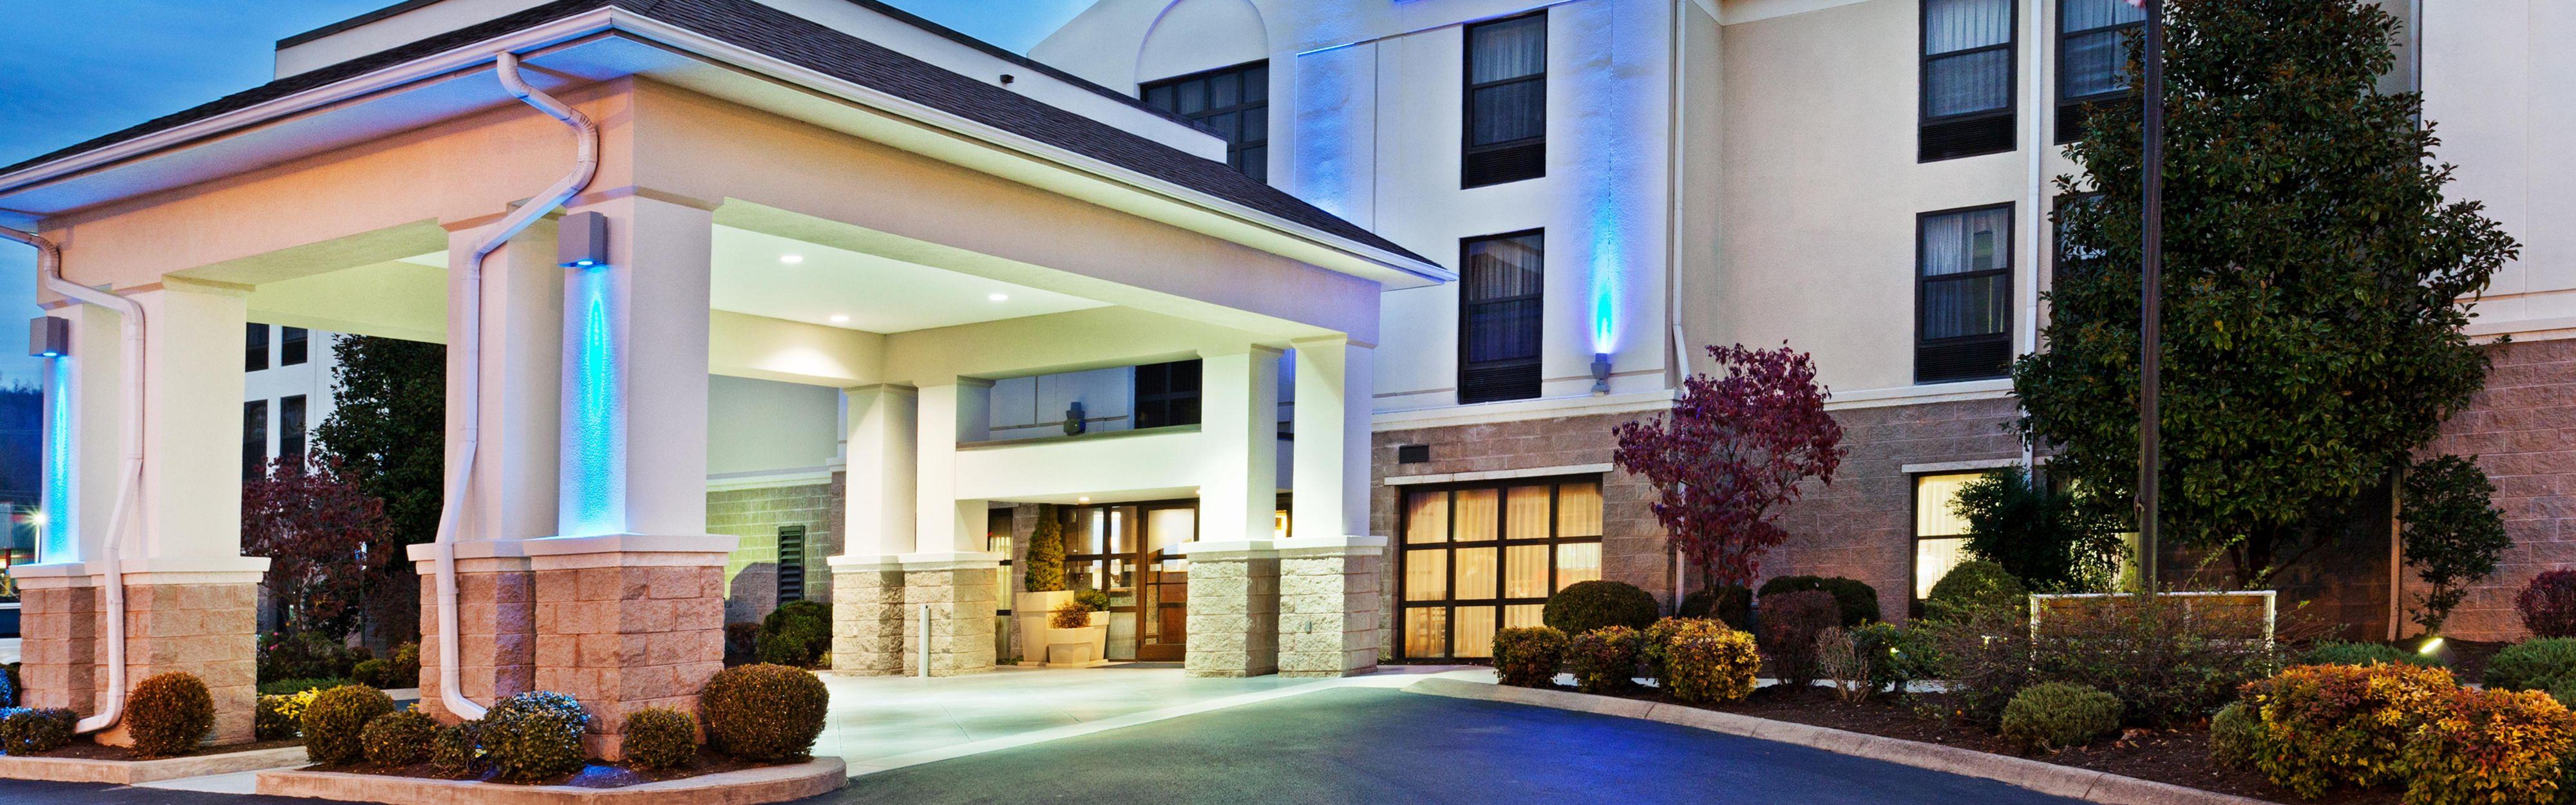 Holiday Inn Express Middlesboro image 0